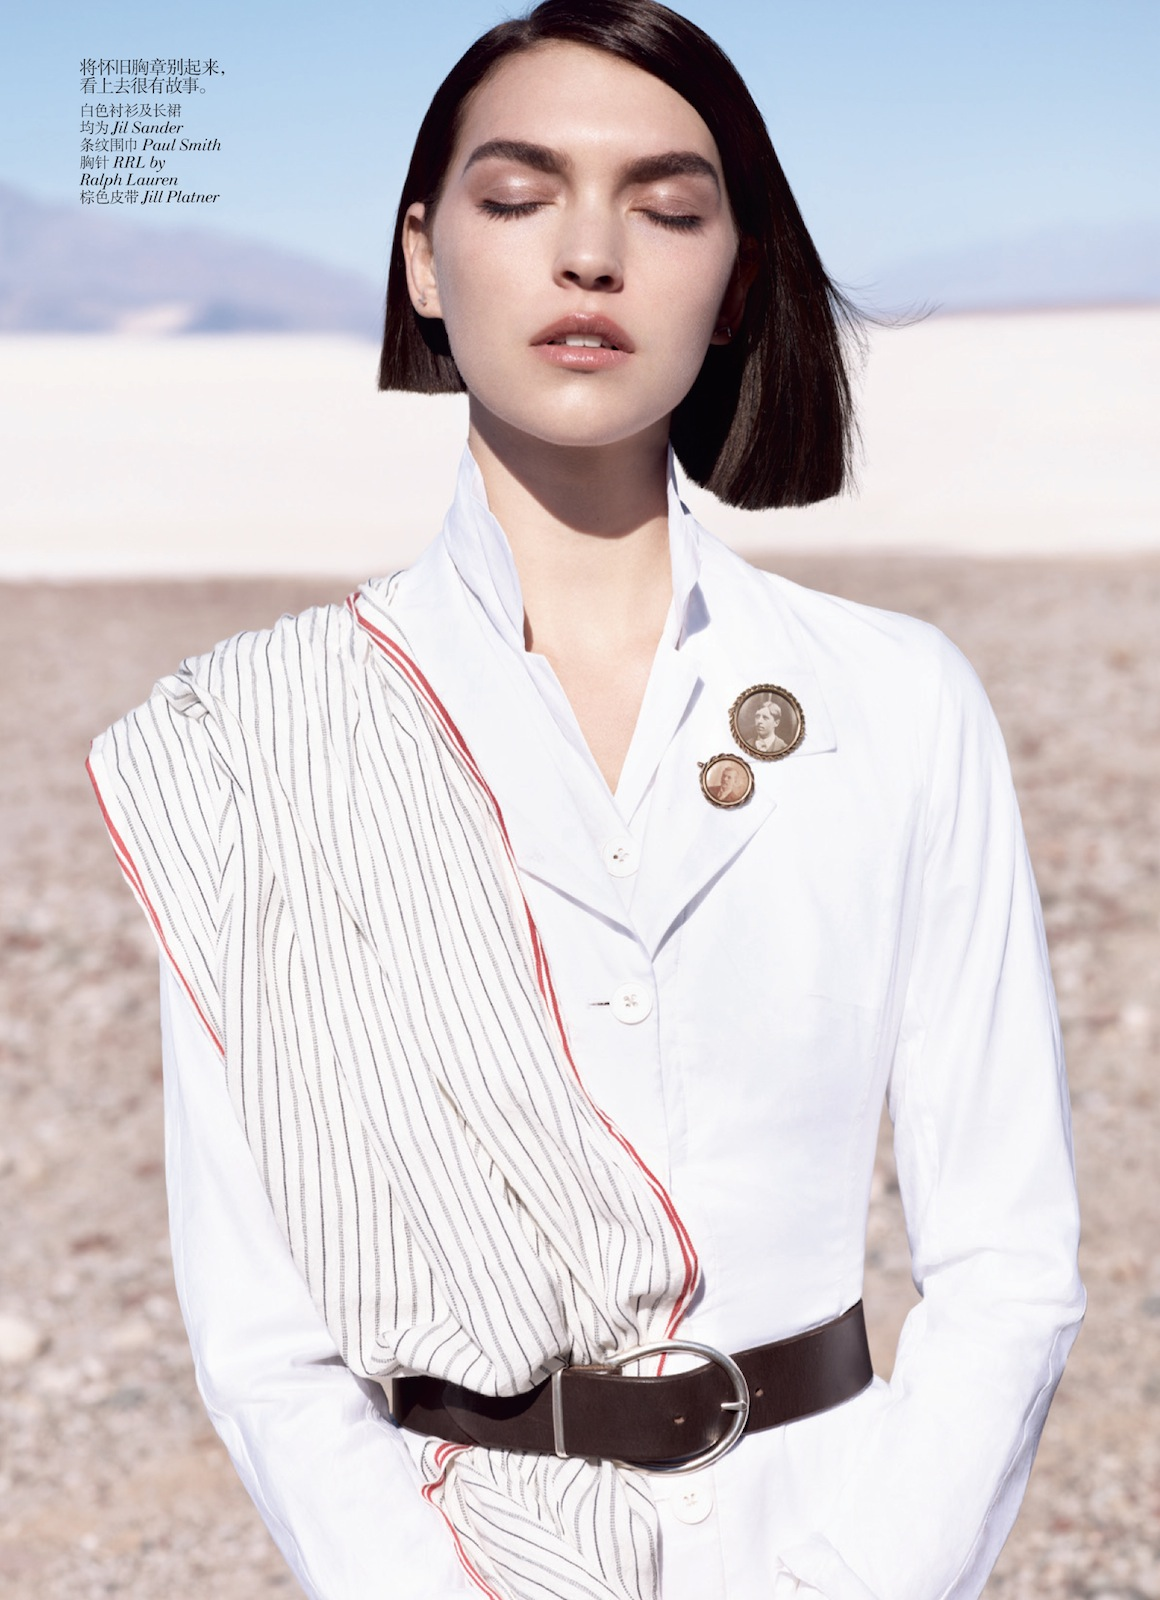 Arizona Muse in Vogue China May 2012 by Josh Olins